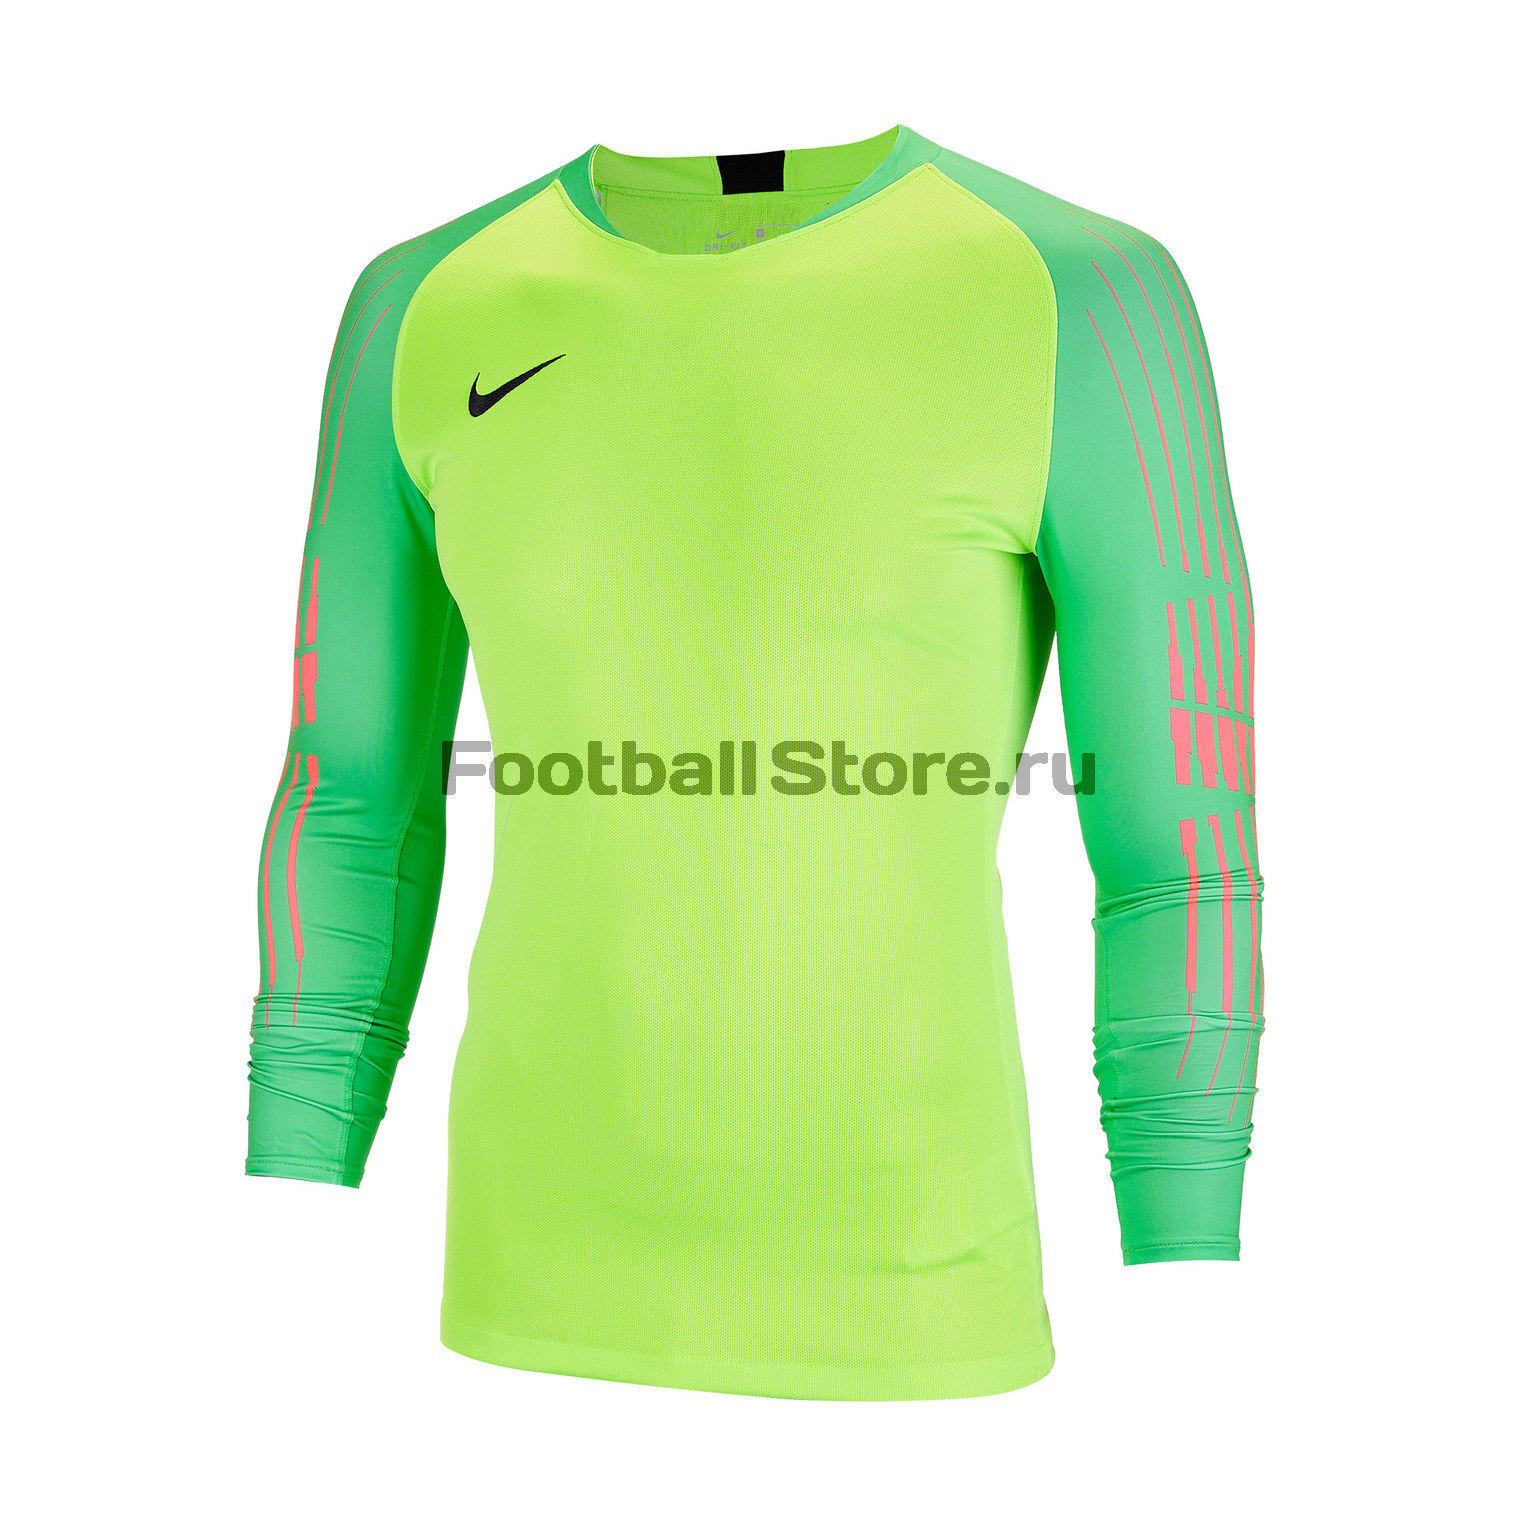 Вратарская футболка Nike Gardien II GK 898043-398